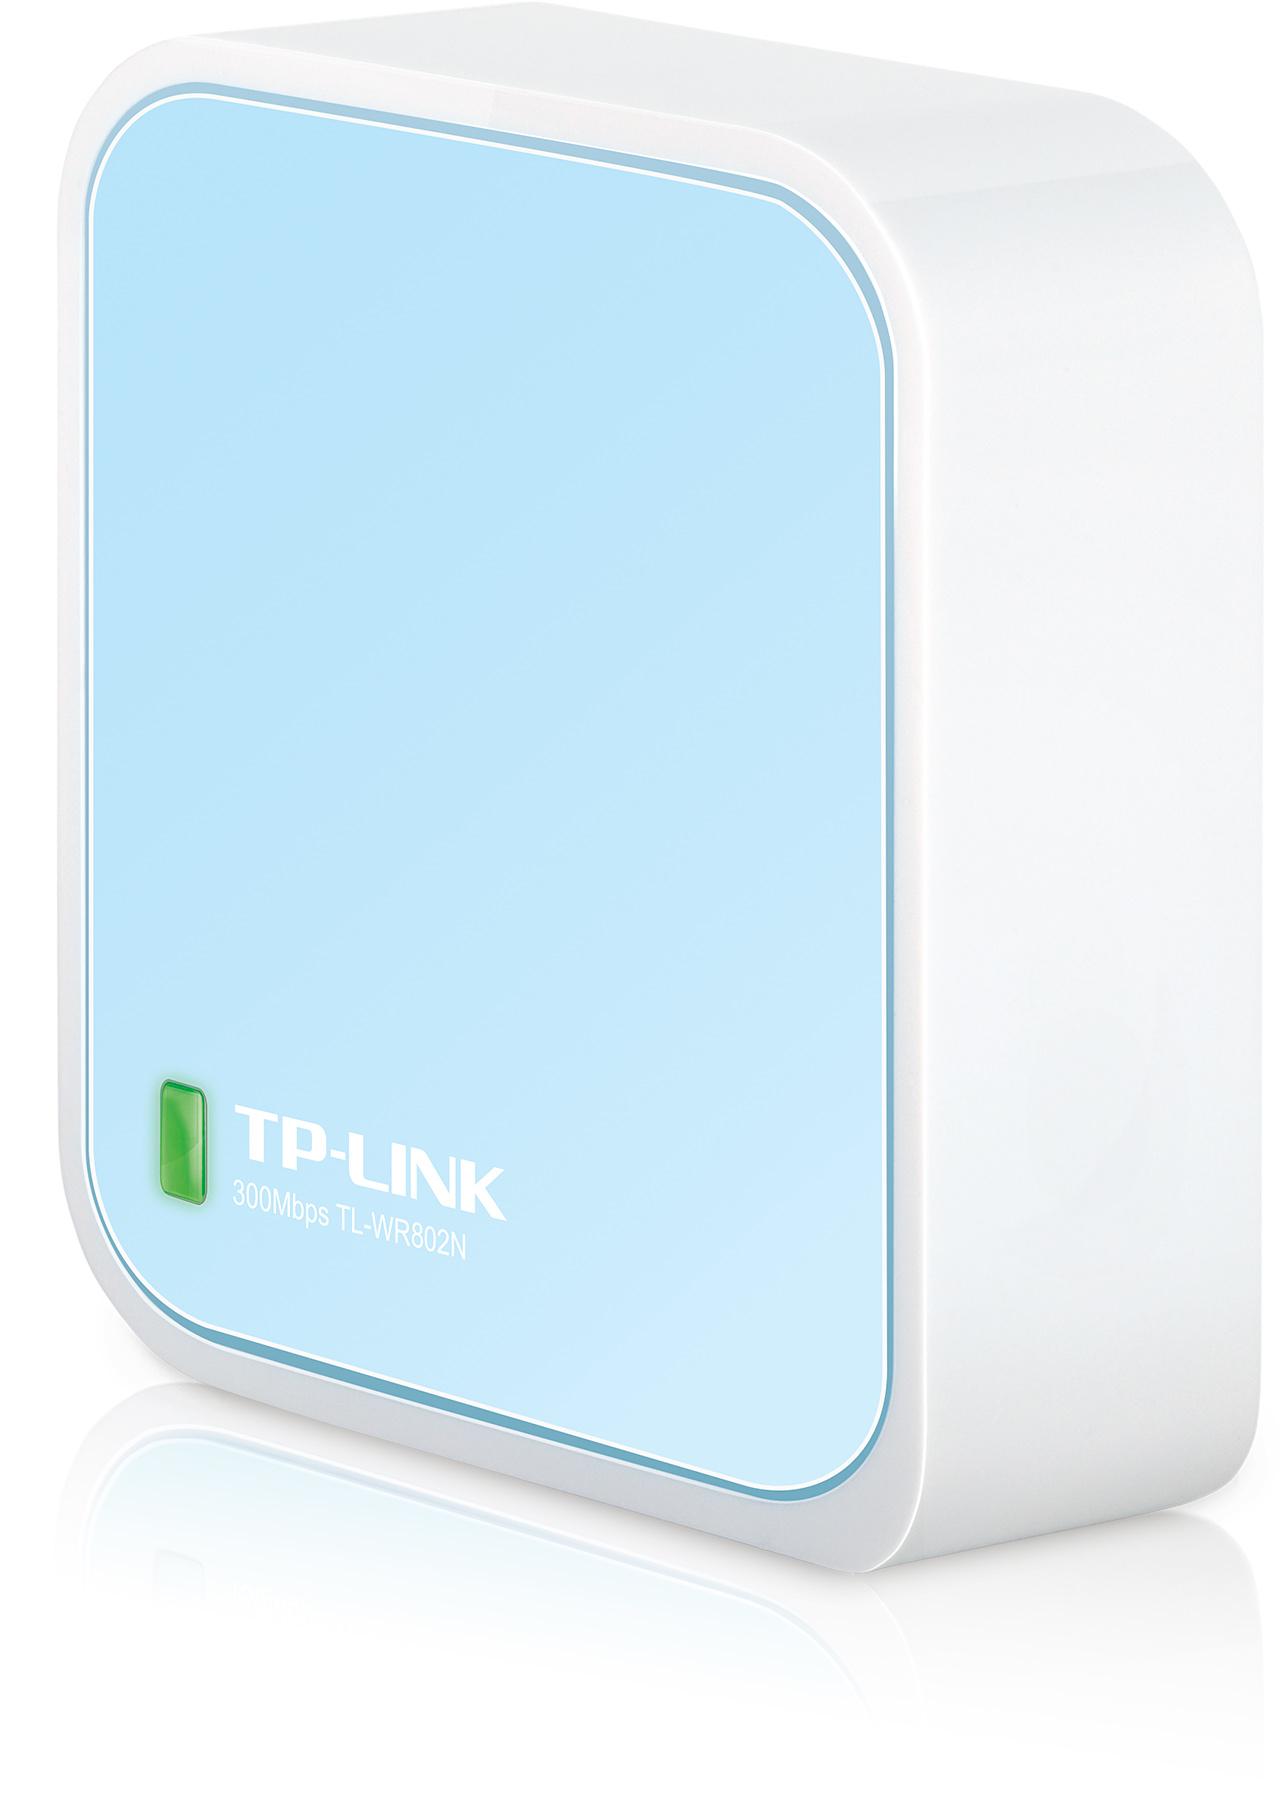 TP-LINK TL-WR802N AP Router